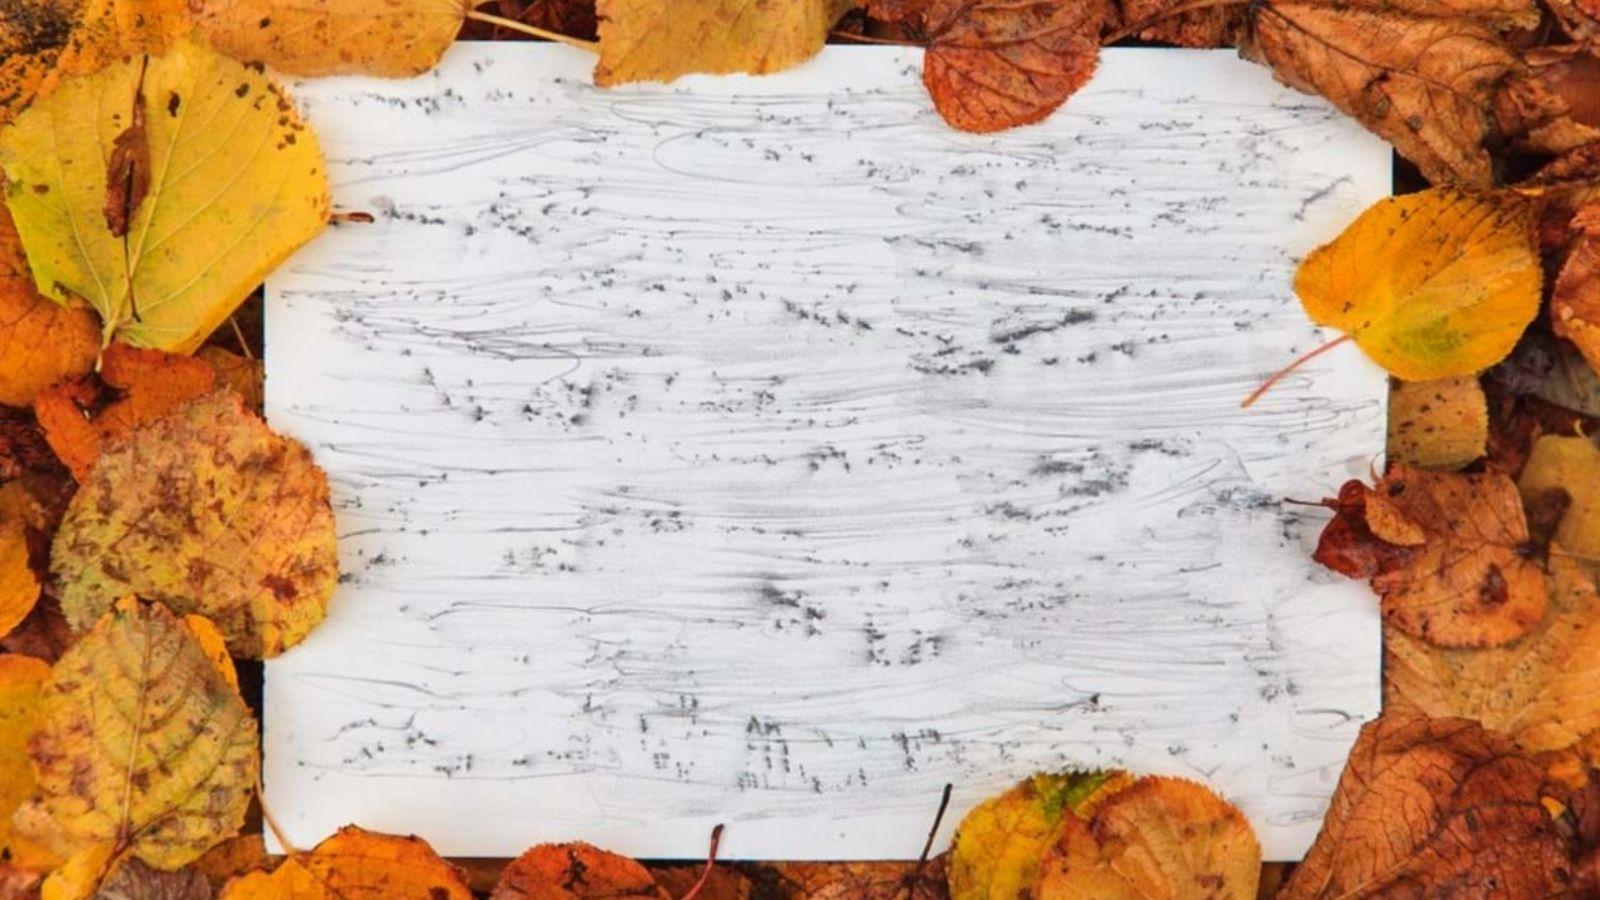 Bark Rubbing sheet amongst autumn leaves